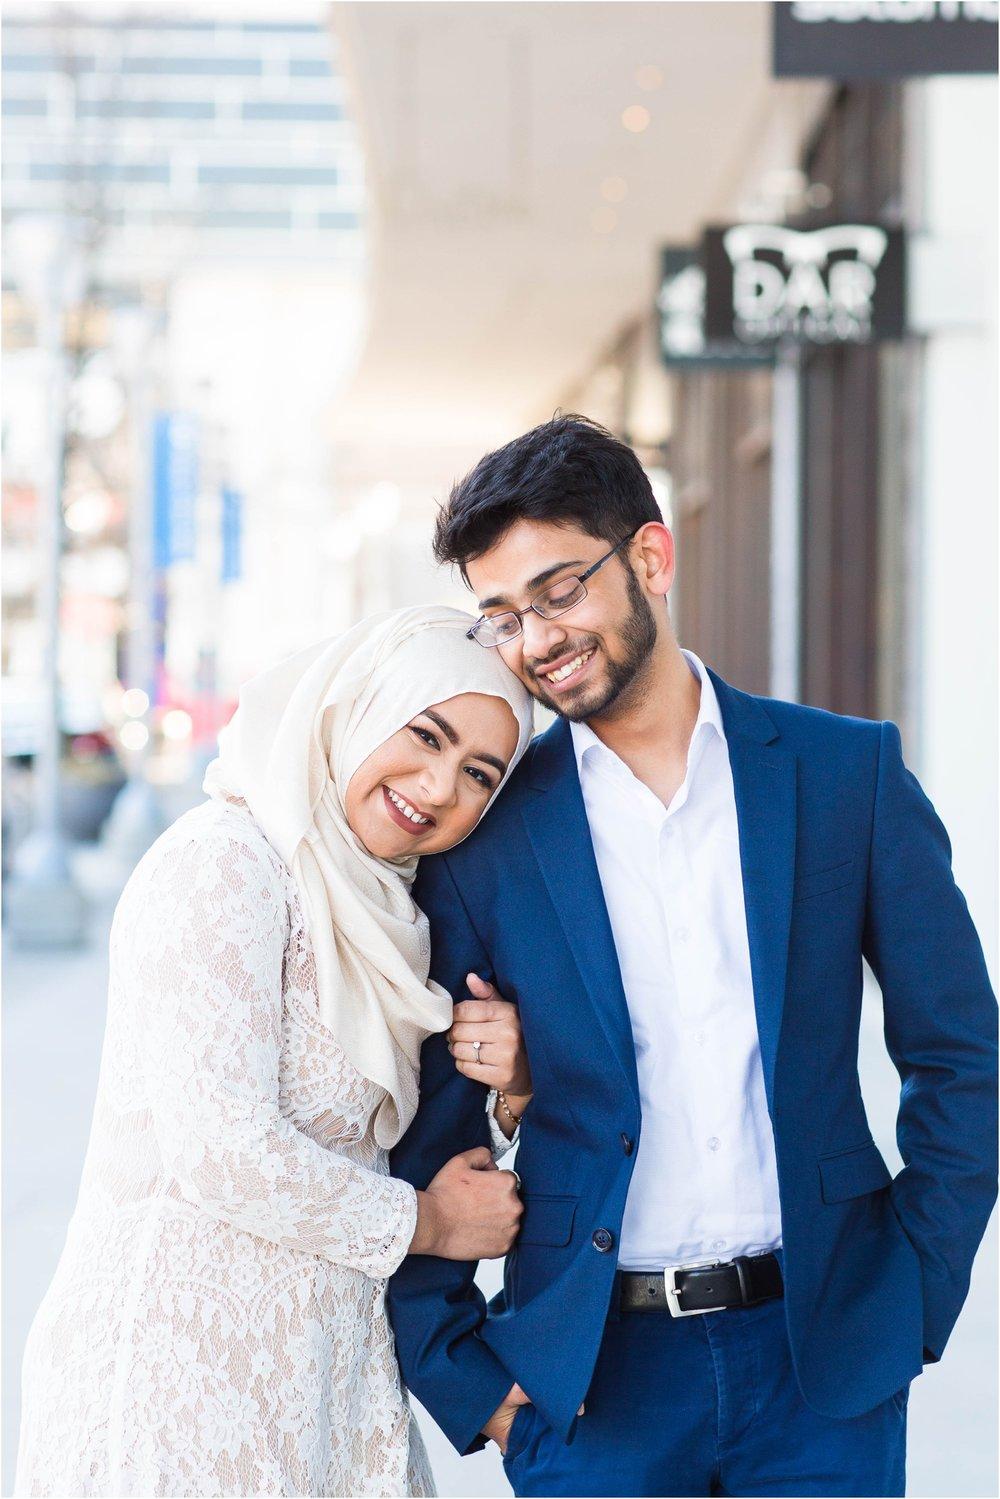 Shops-at-Don-Mills-Engagement-Session-Toronto-Mississauga-Brampton-Scarborough-GTA-Pakistani-Indian-Wedding-Engagement-Photographer-Photography_0003.jpg